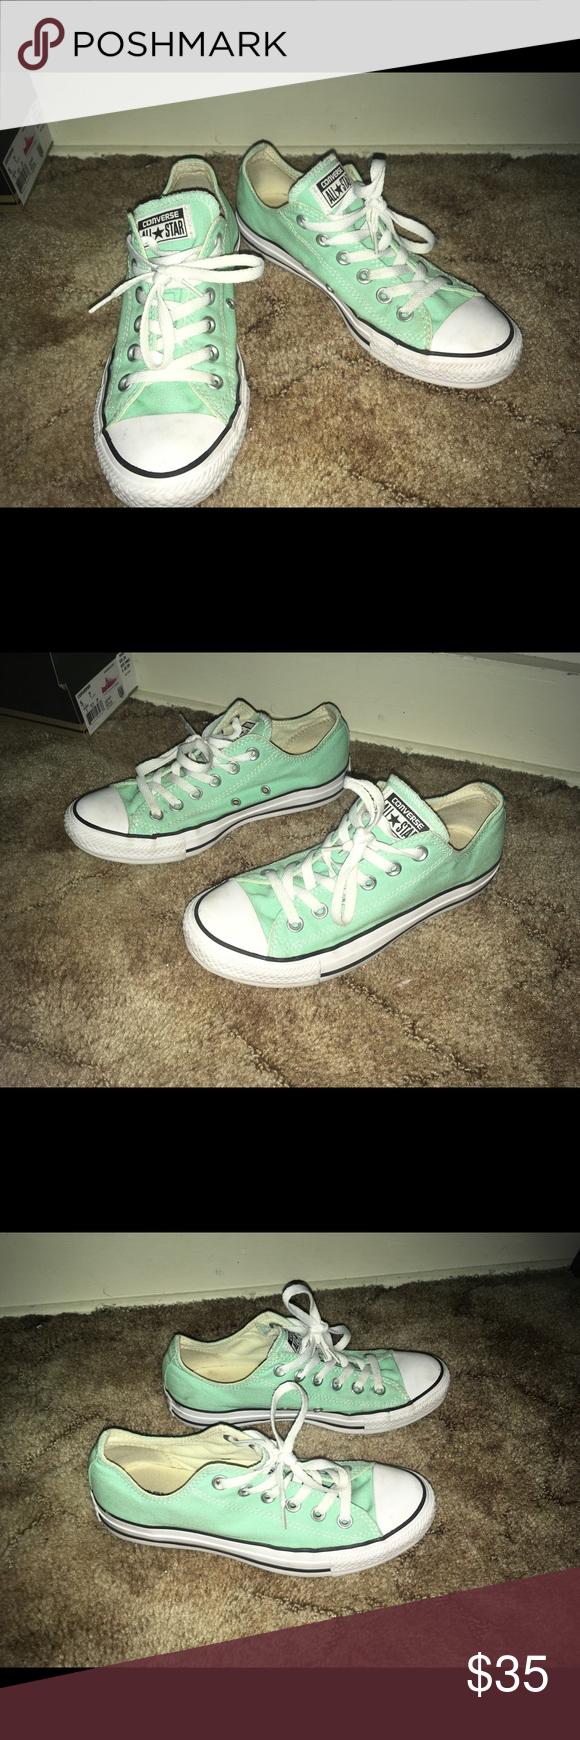 454e44a715c104 Mint Green Converse Mint Green Converse 💚💙 Light wear Size 7 women Mens 5  Willing to negotiate